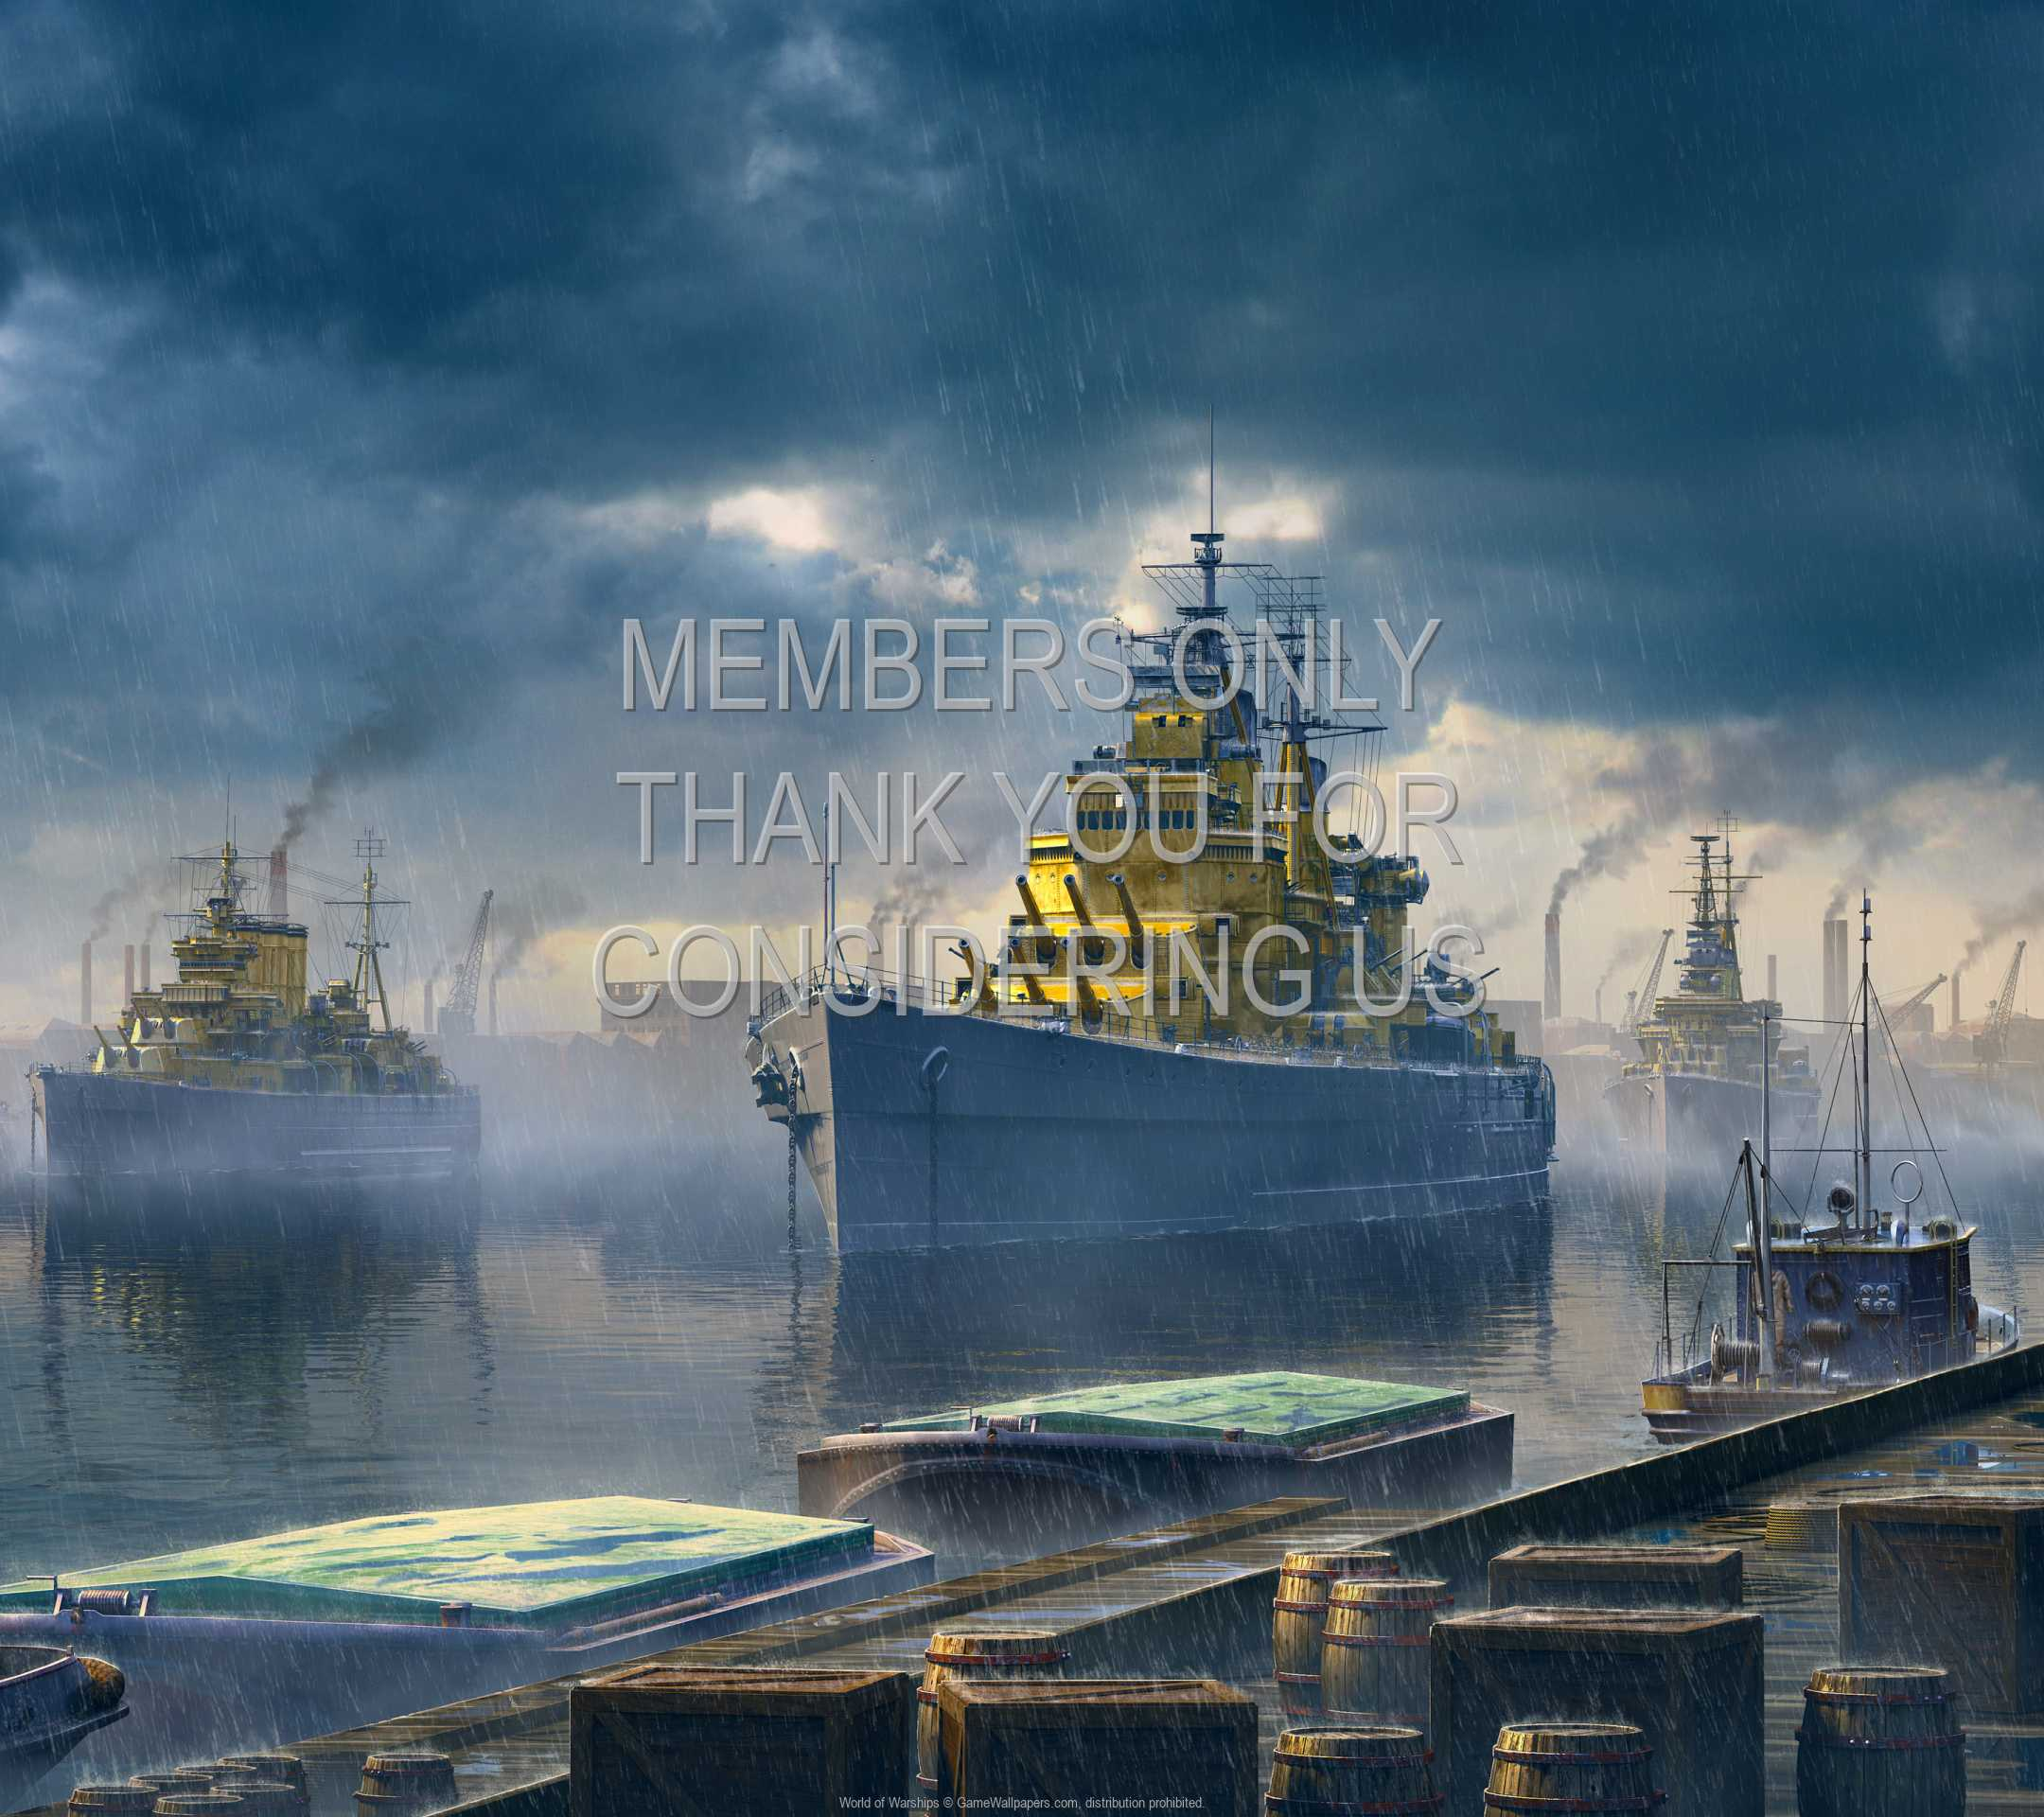 World of Warships 1080p Horizontal Mobile wallpaper or background 24